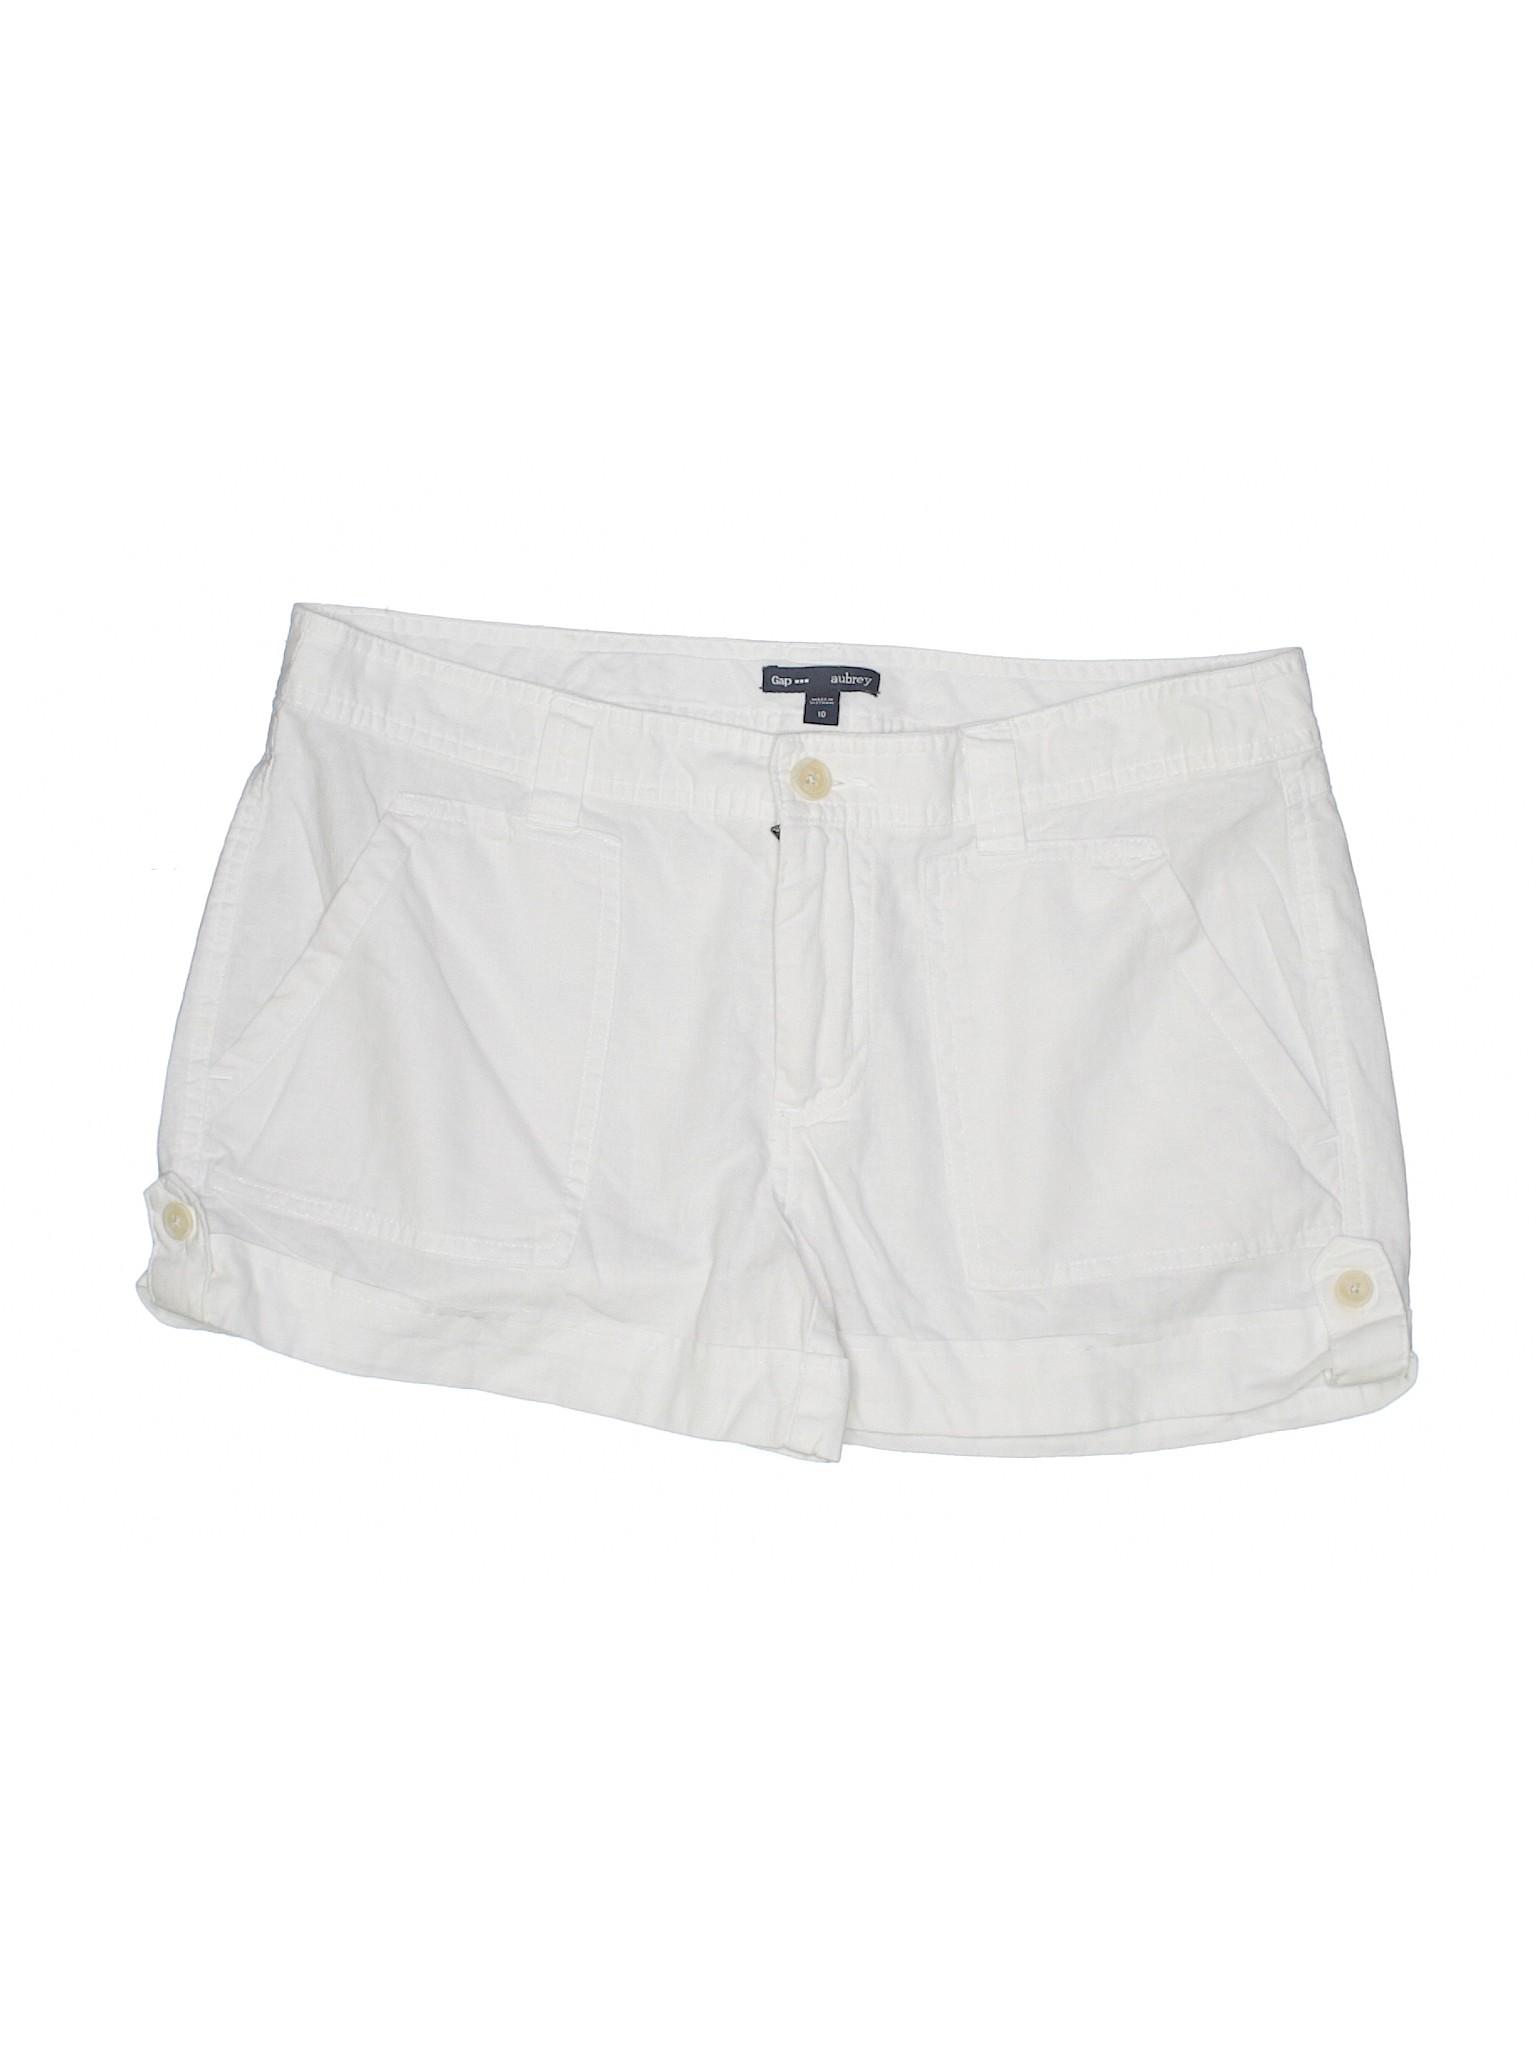 Gap Shorts Boutique Gap Shorts Gap Boutique Shorts Boutique Boutique 0Bzgd7qW